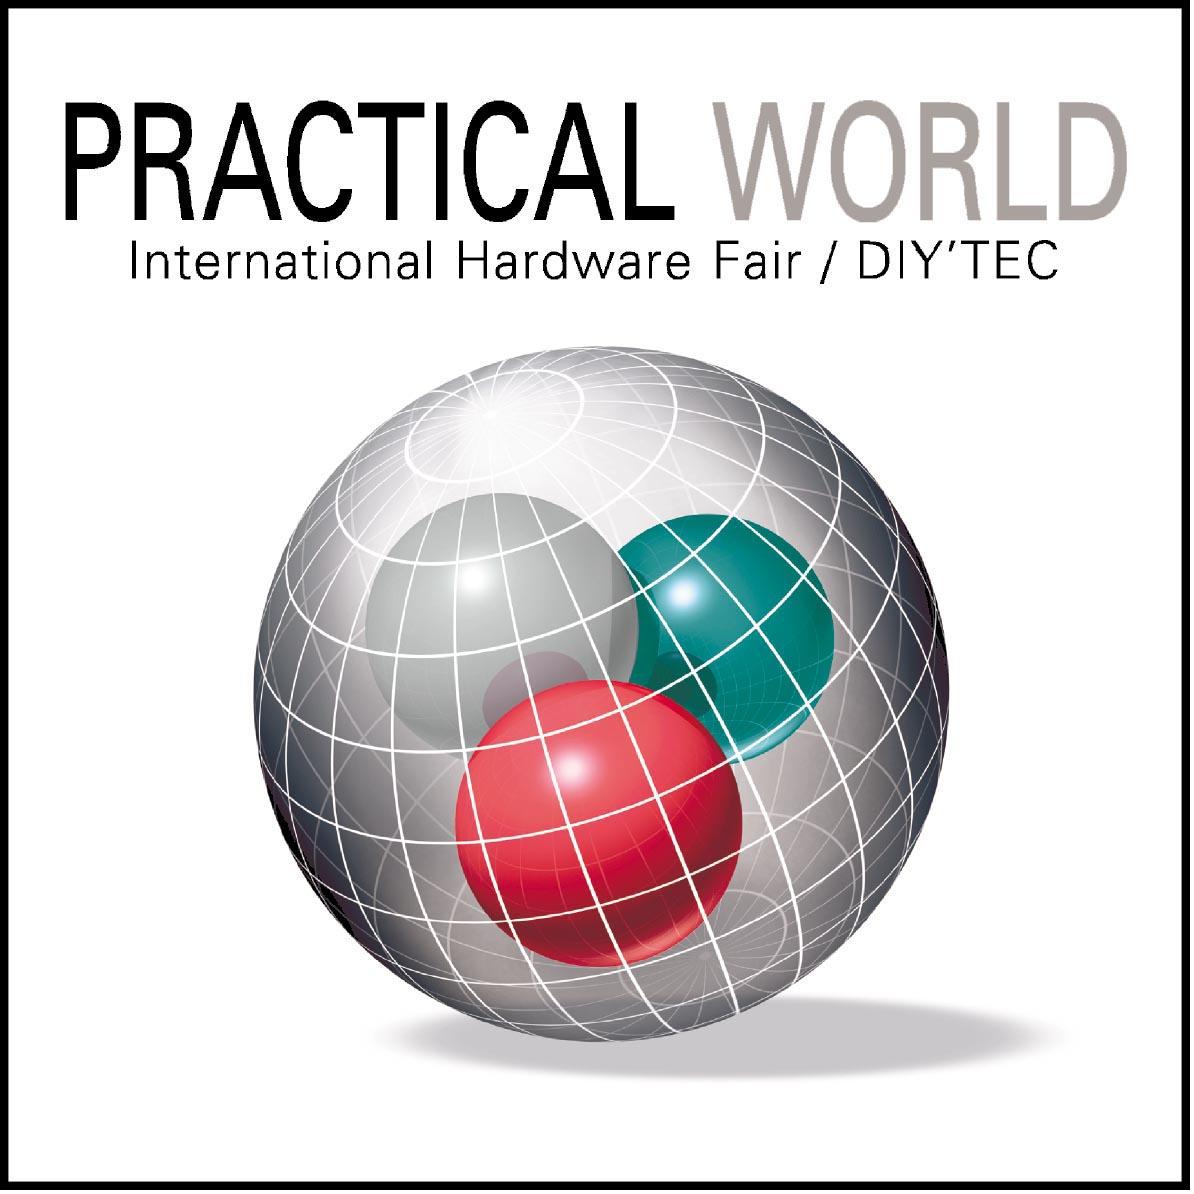 International Hardware Trade Fair 2004, Colonge